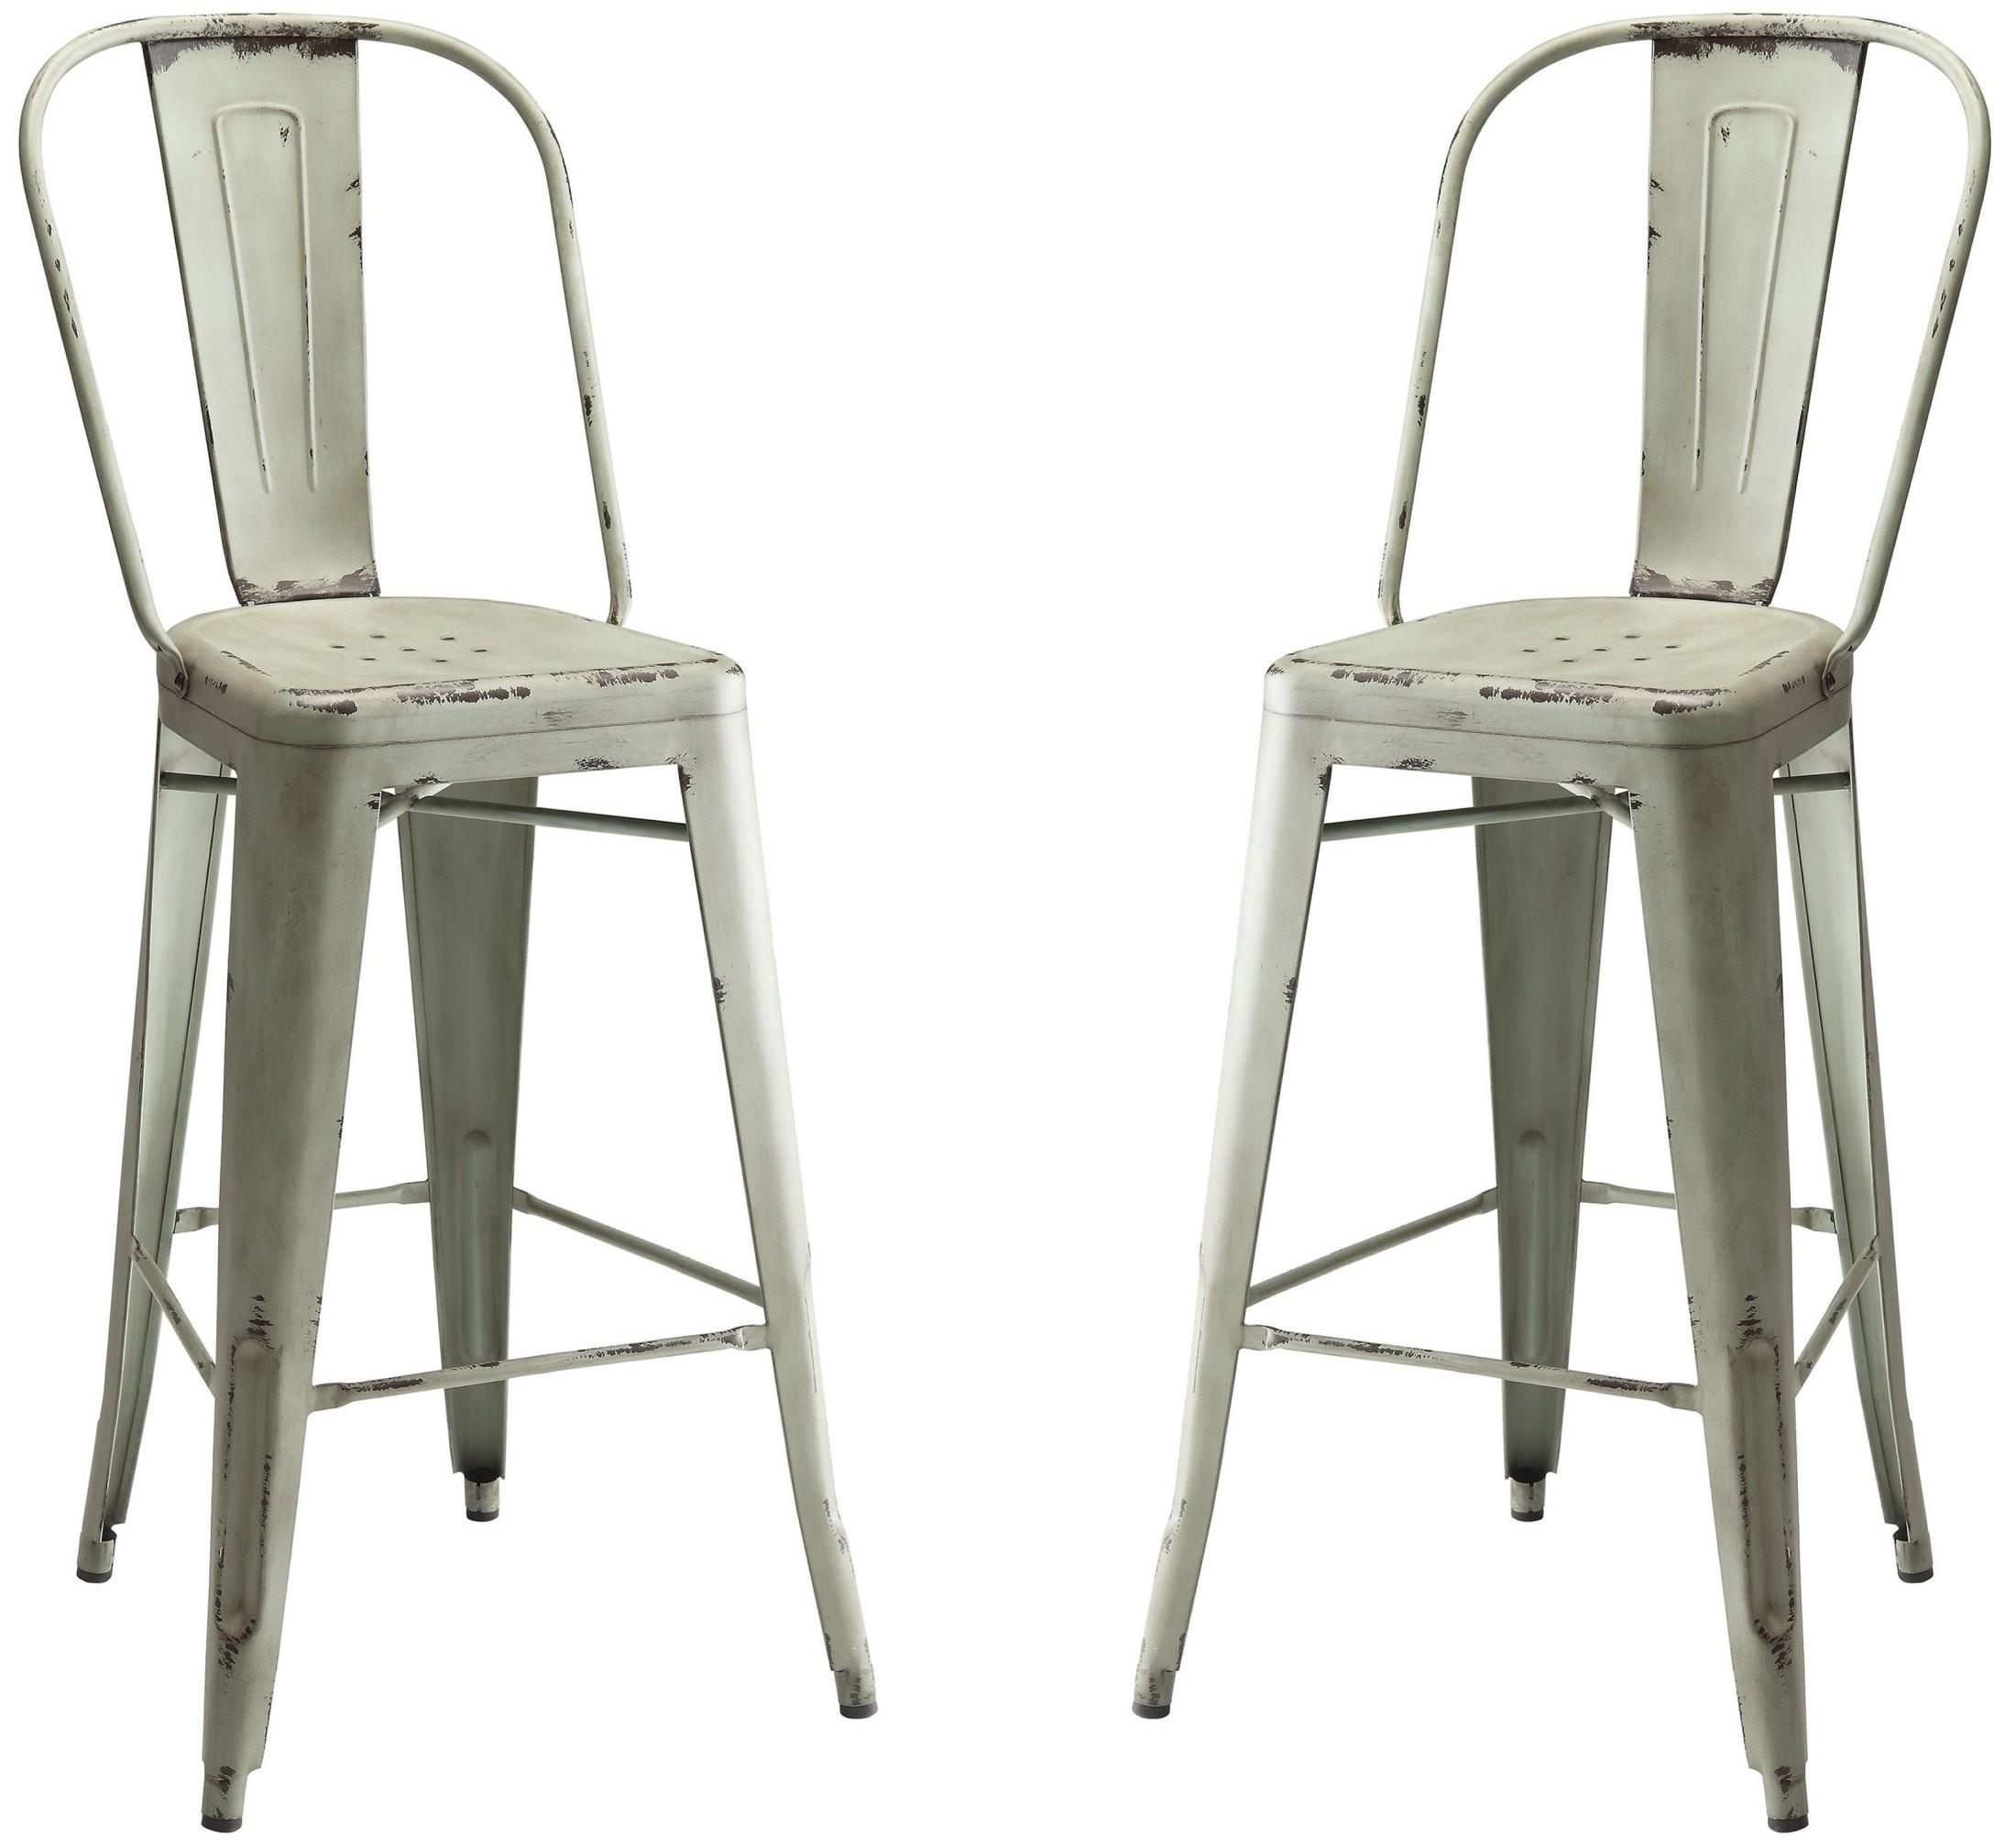 Blue Metal Bar Stool 106014 Coaster Furniture : 106014 b1 from colemanfurniture.com size 2200 x 2017 jpeg 328kB